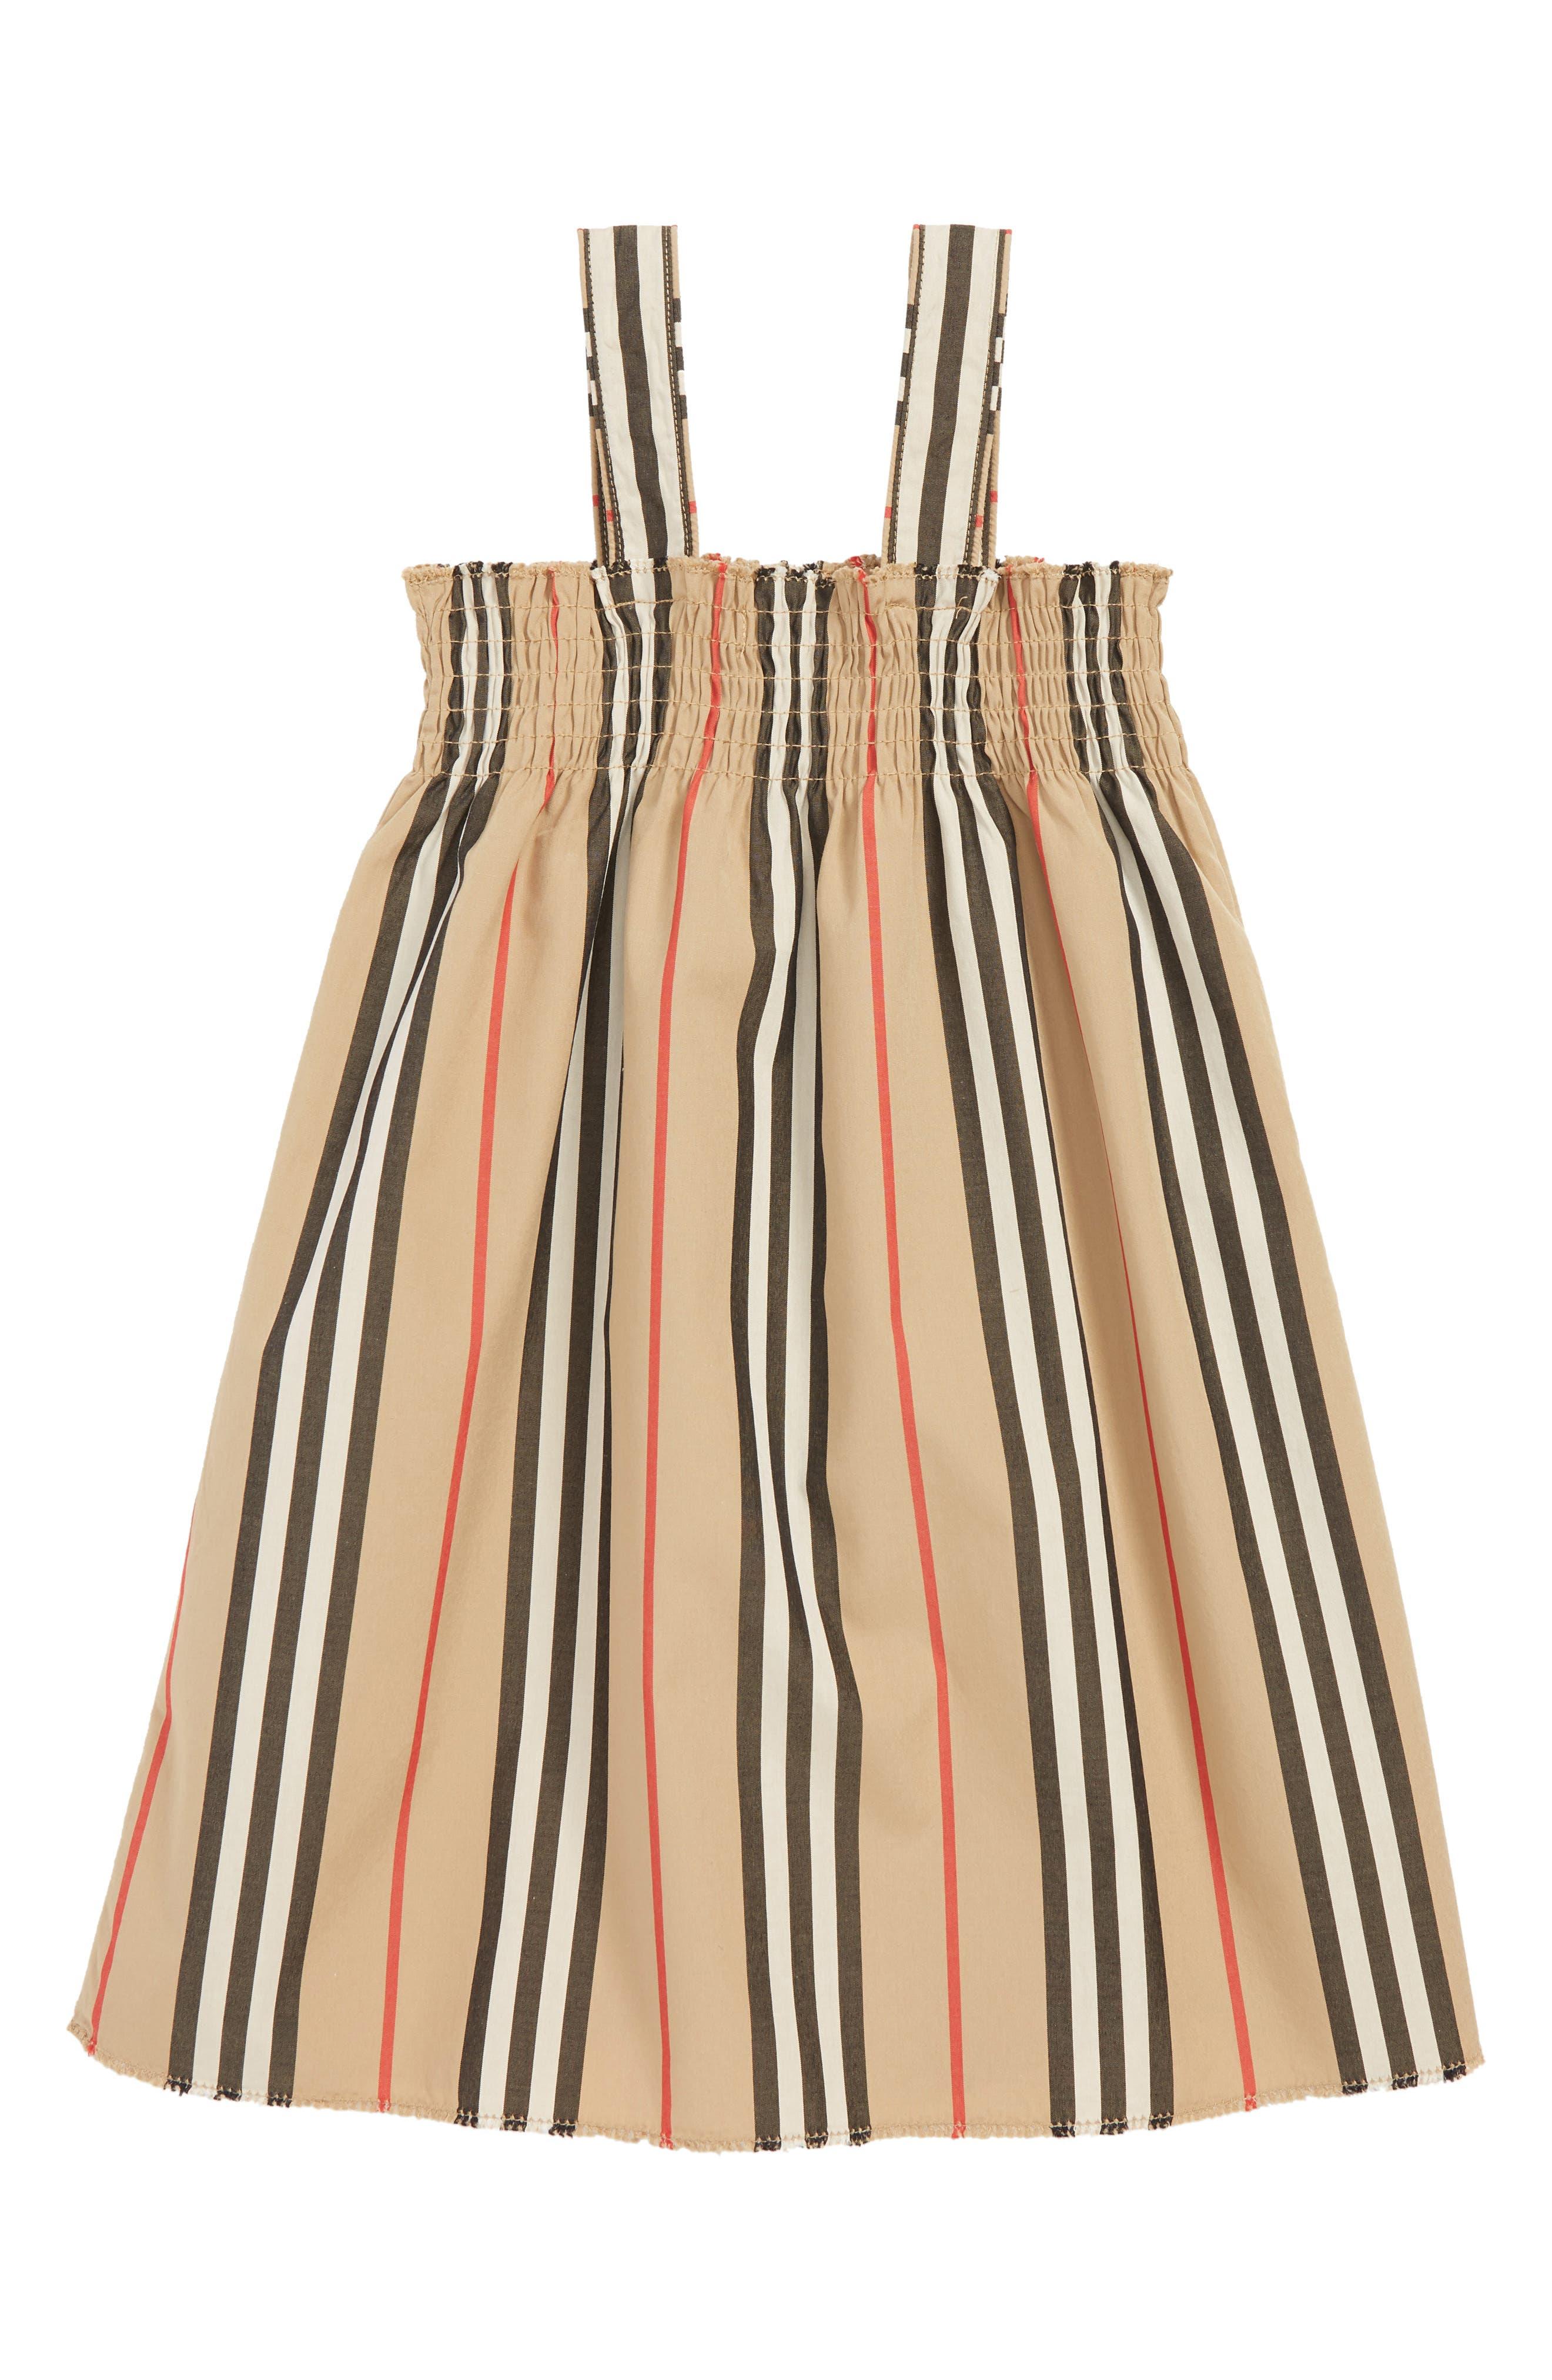 BURBERRY, Mini Junia Stripe Dress, Alternate thumbnail 2, color, BEIGE